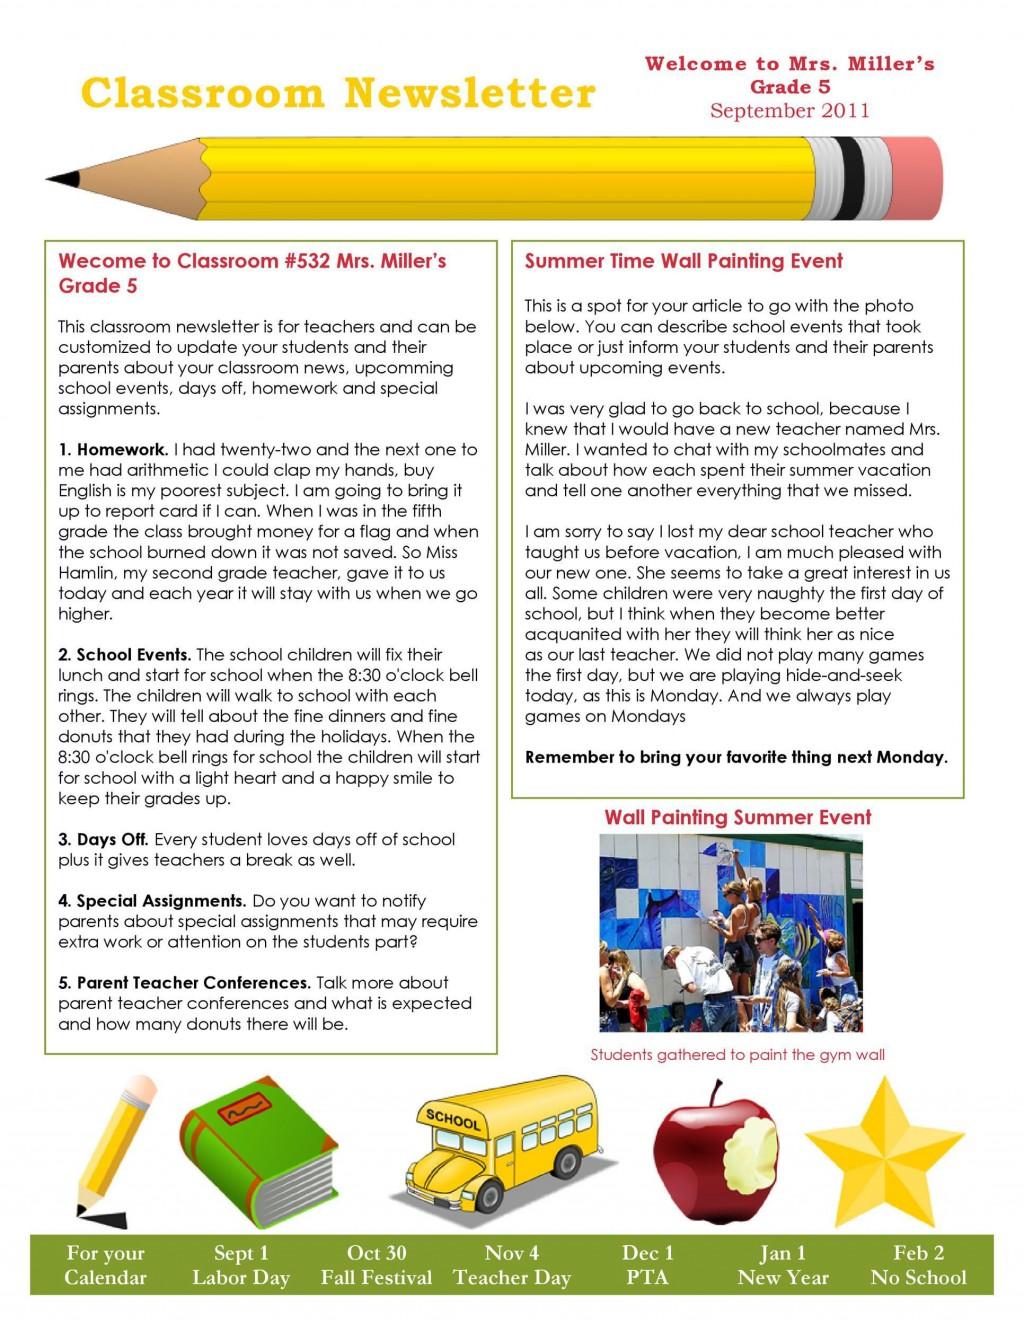 007 Magnificent Newsletter Template For Teacher To Parent Image  ParentsLarge